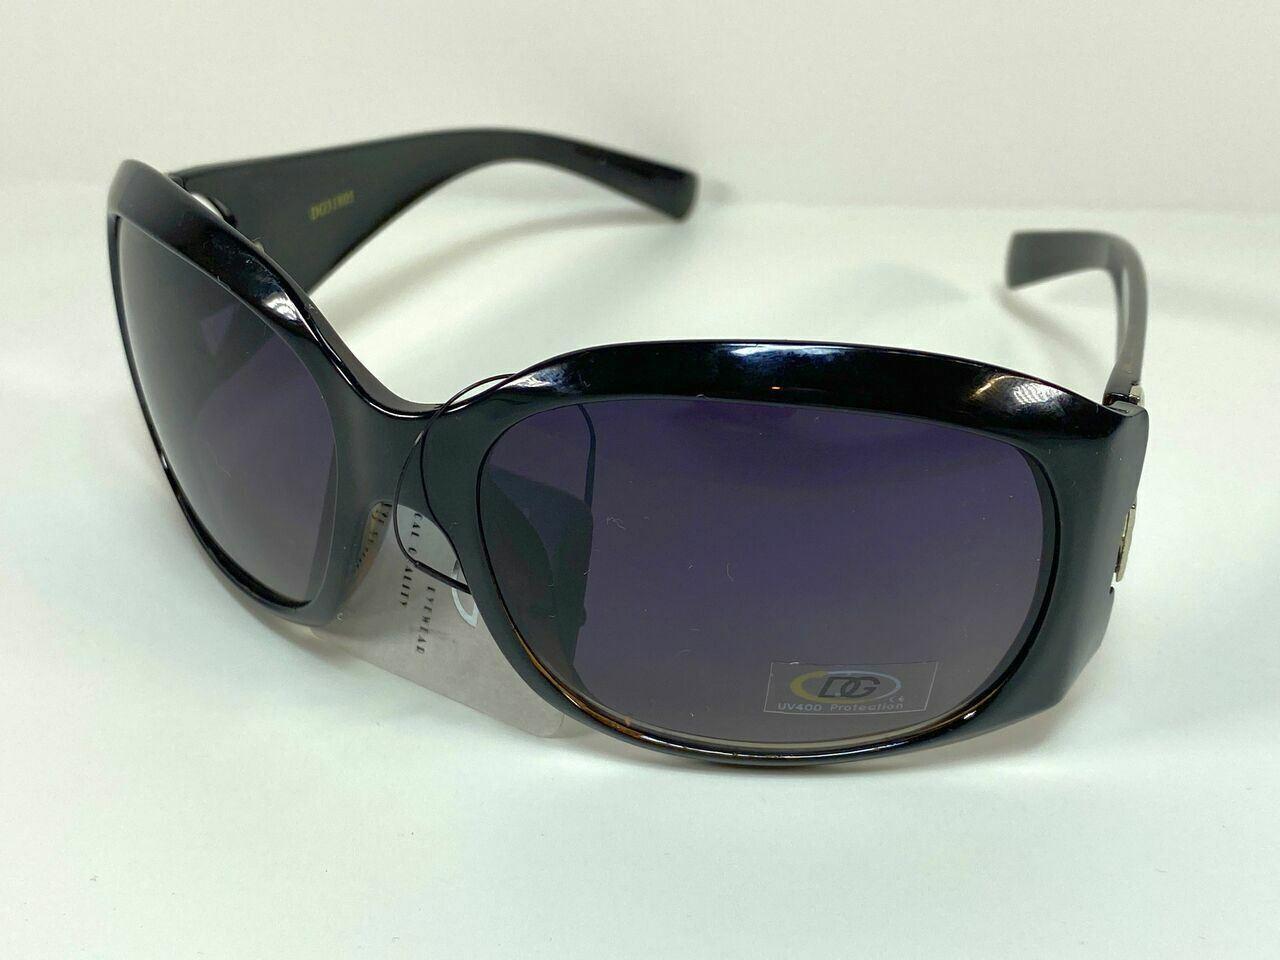 BNWT DG Eyewear Fashion Sunglasses - Women - Black - DG31805